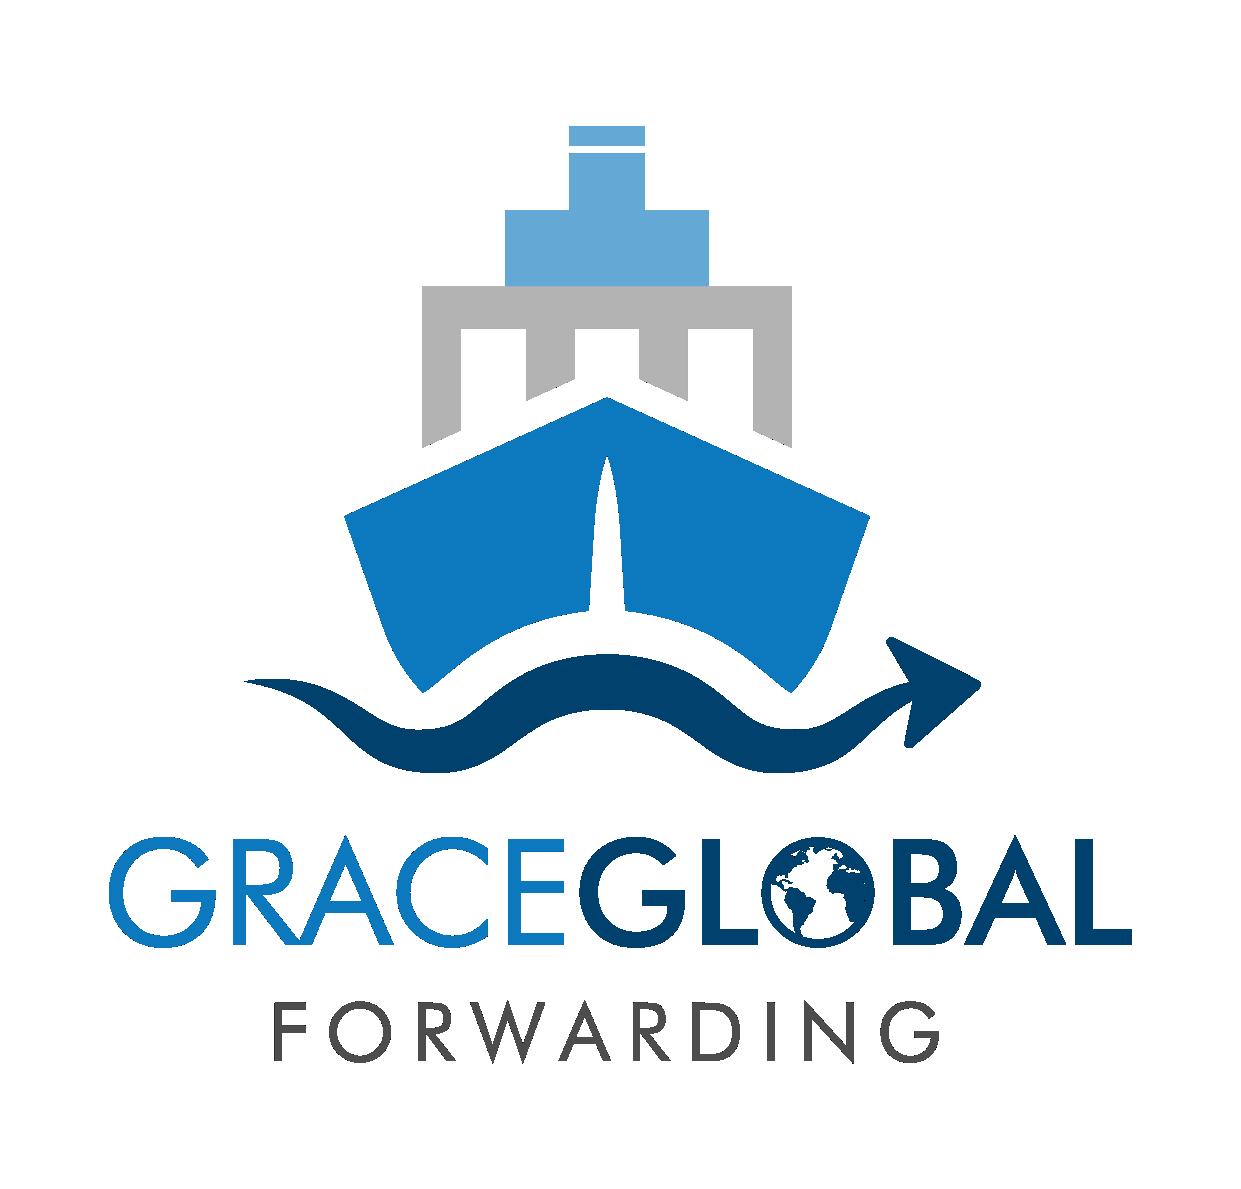 Grace Global Forwarding.png